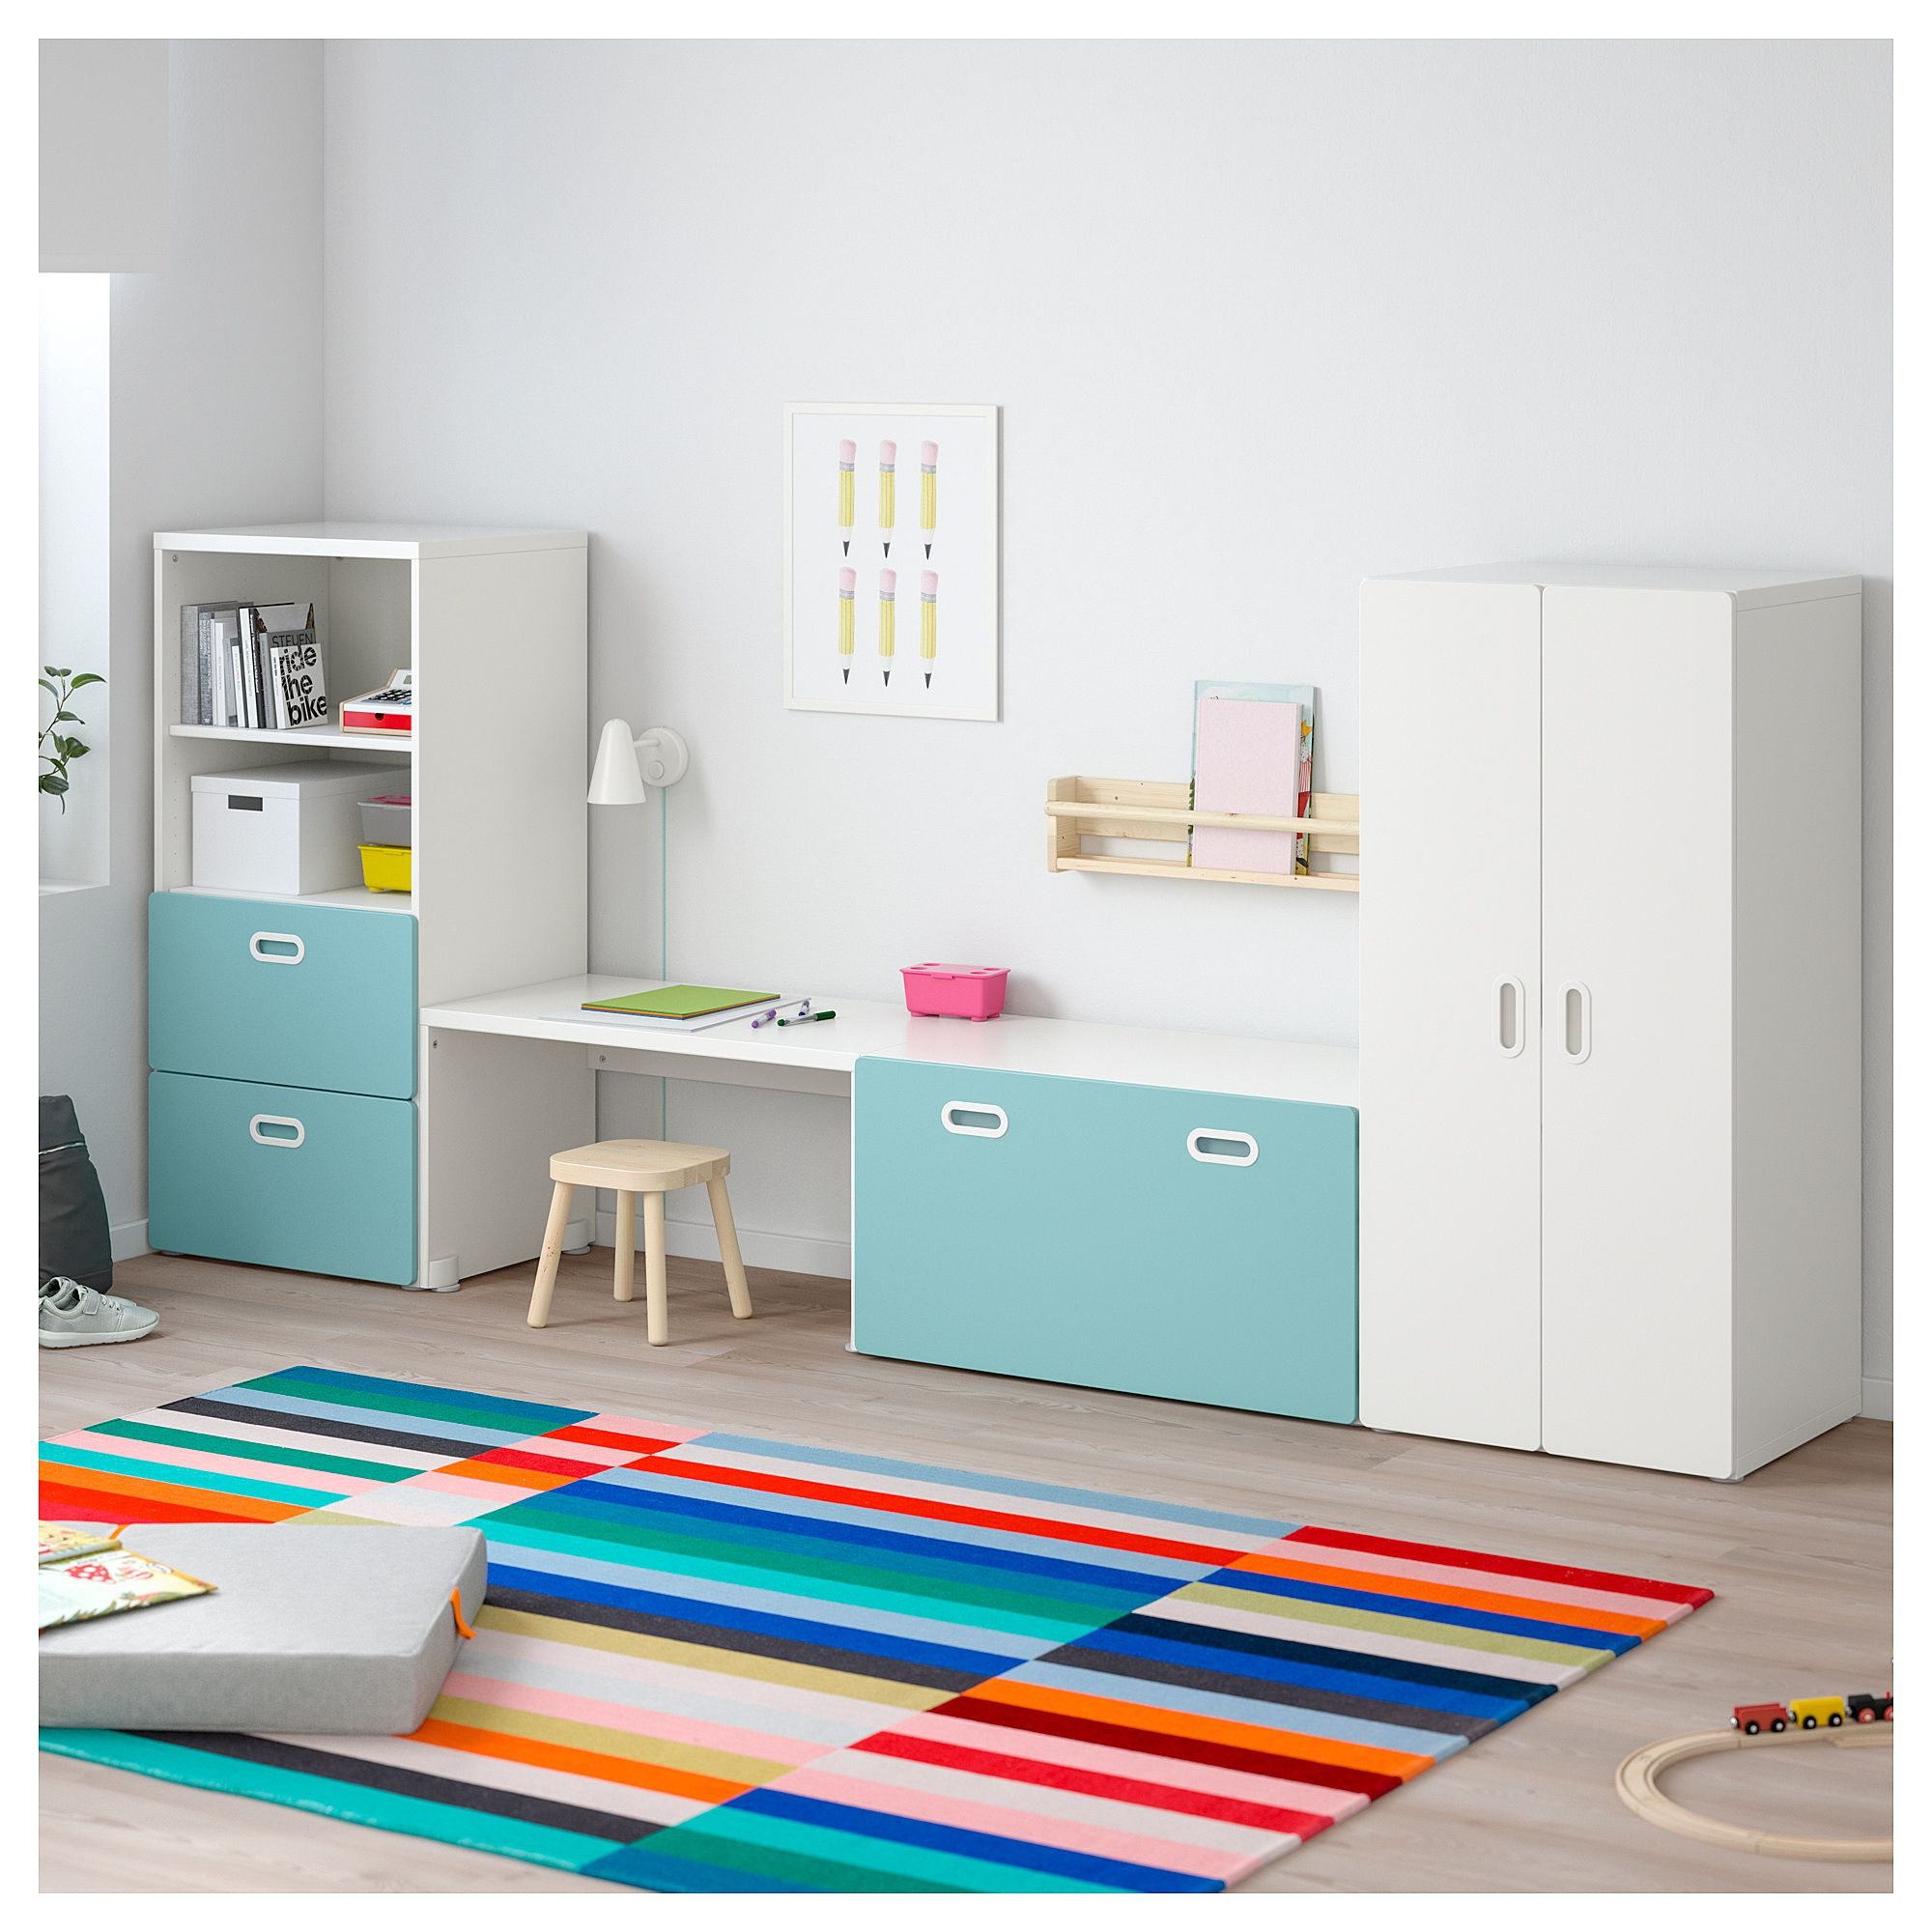 stuva / fritids storage combination, white, light blue in 2018